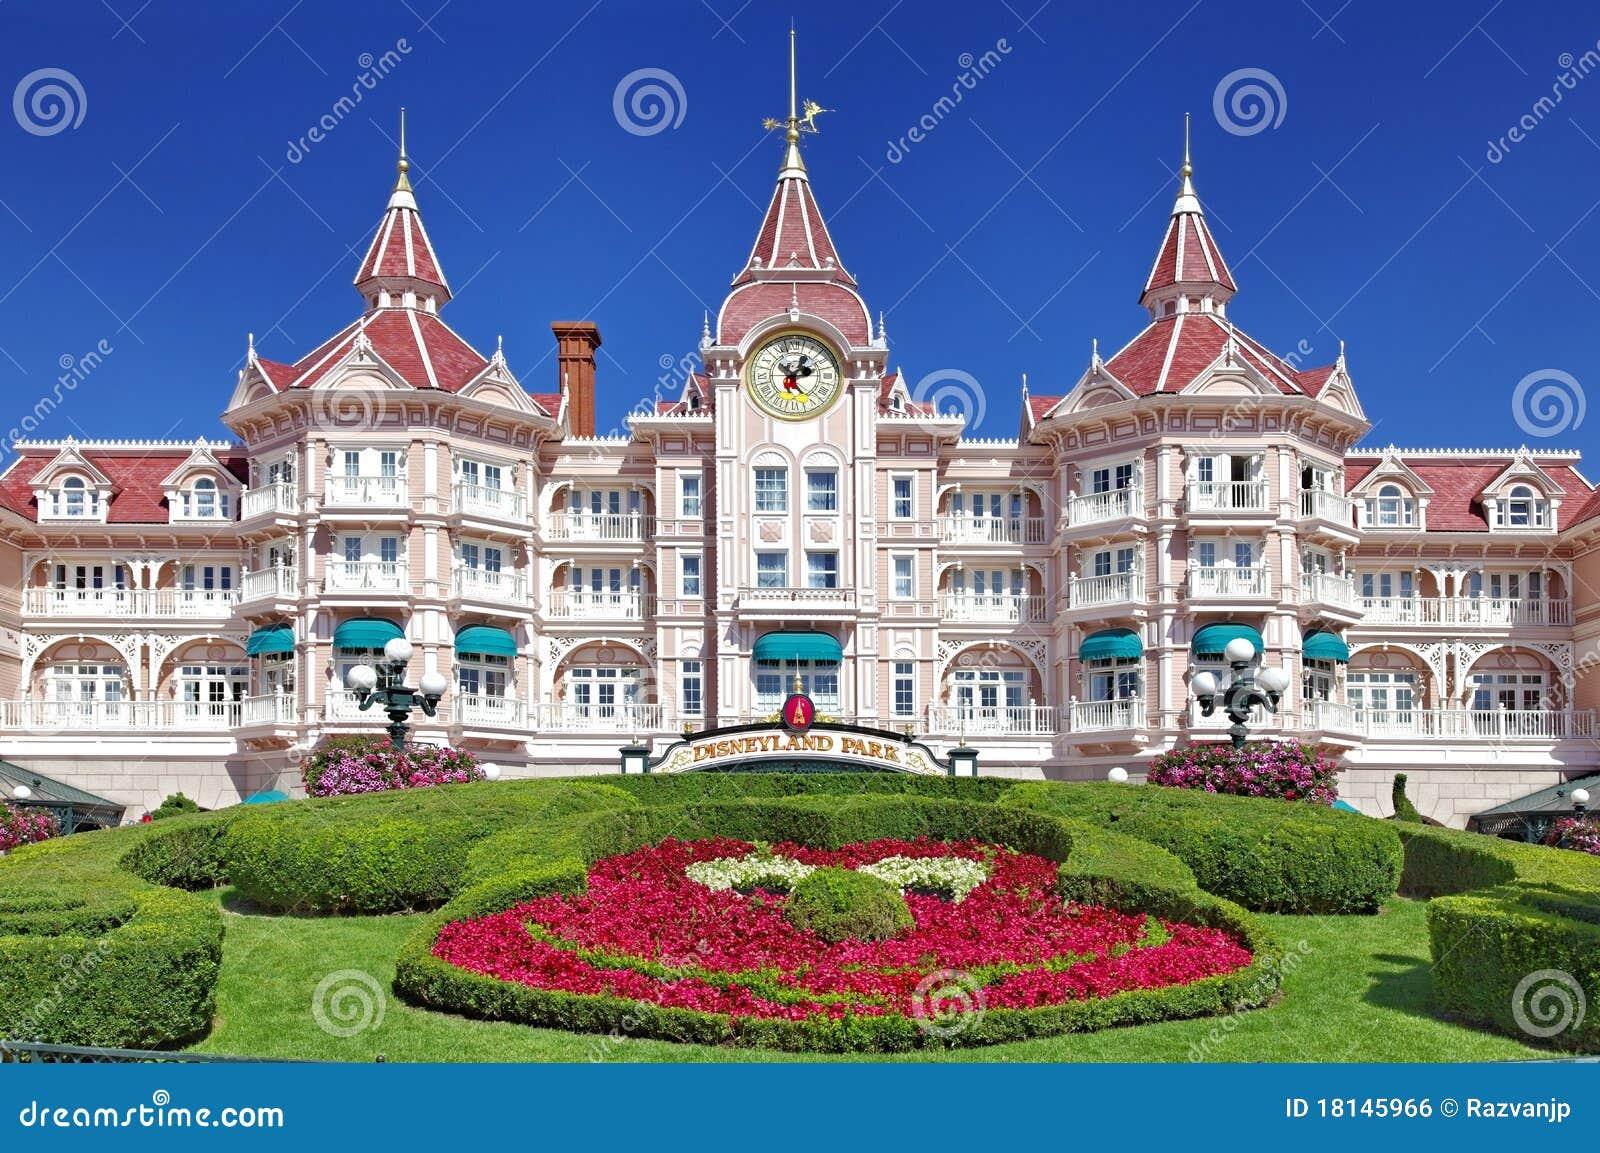 Entrance in Disneyland Paris